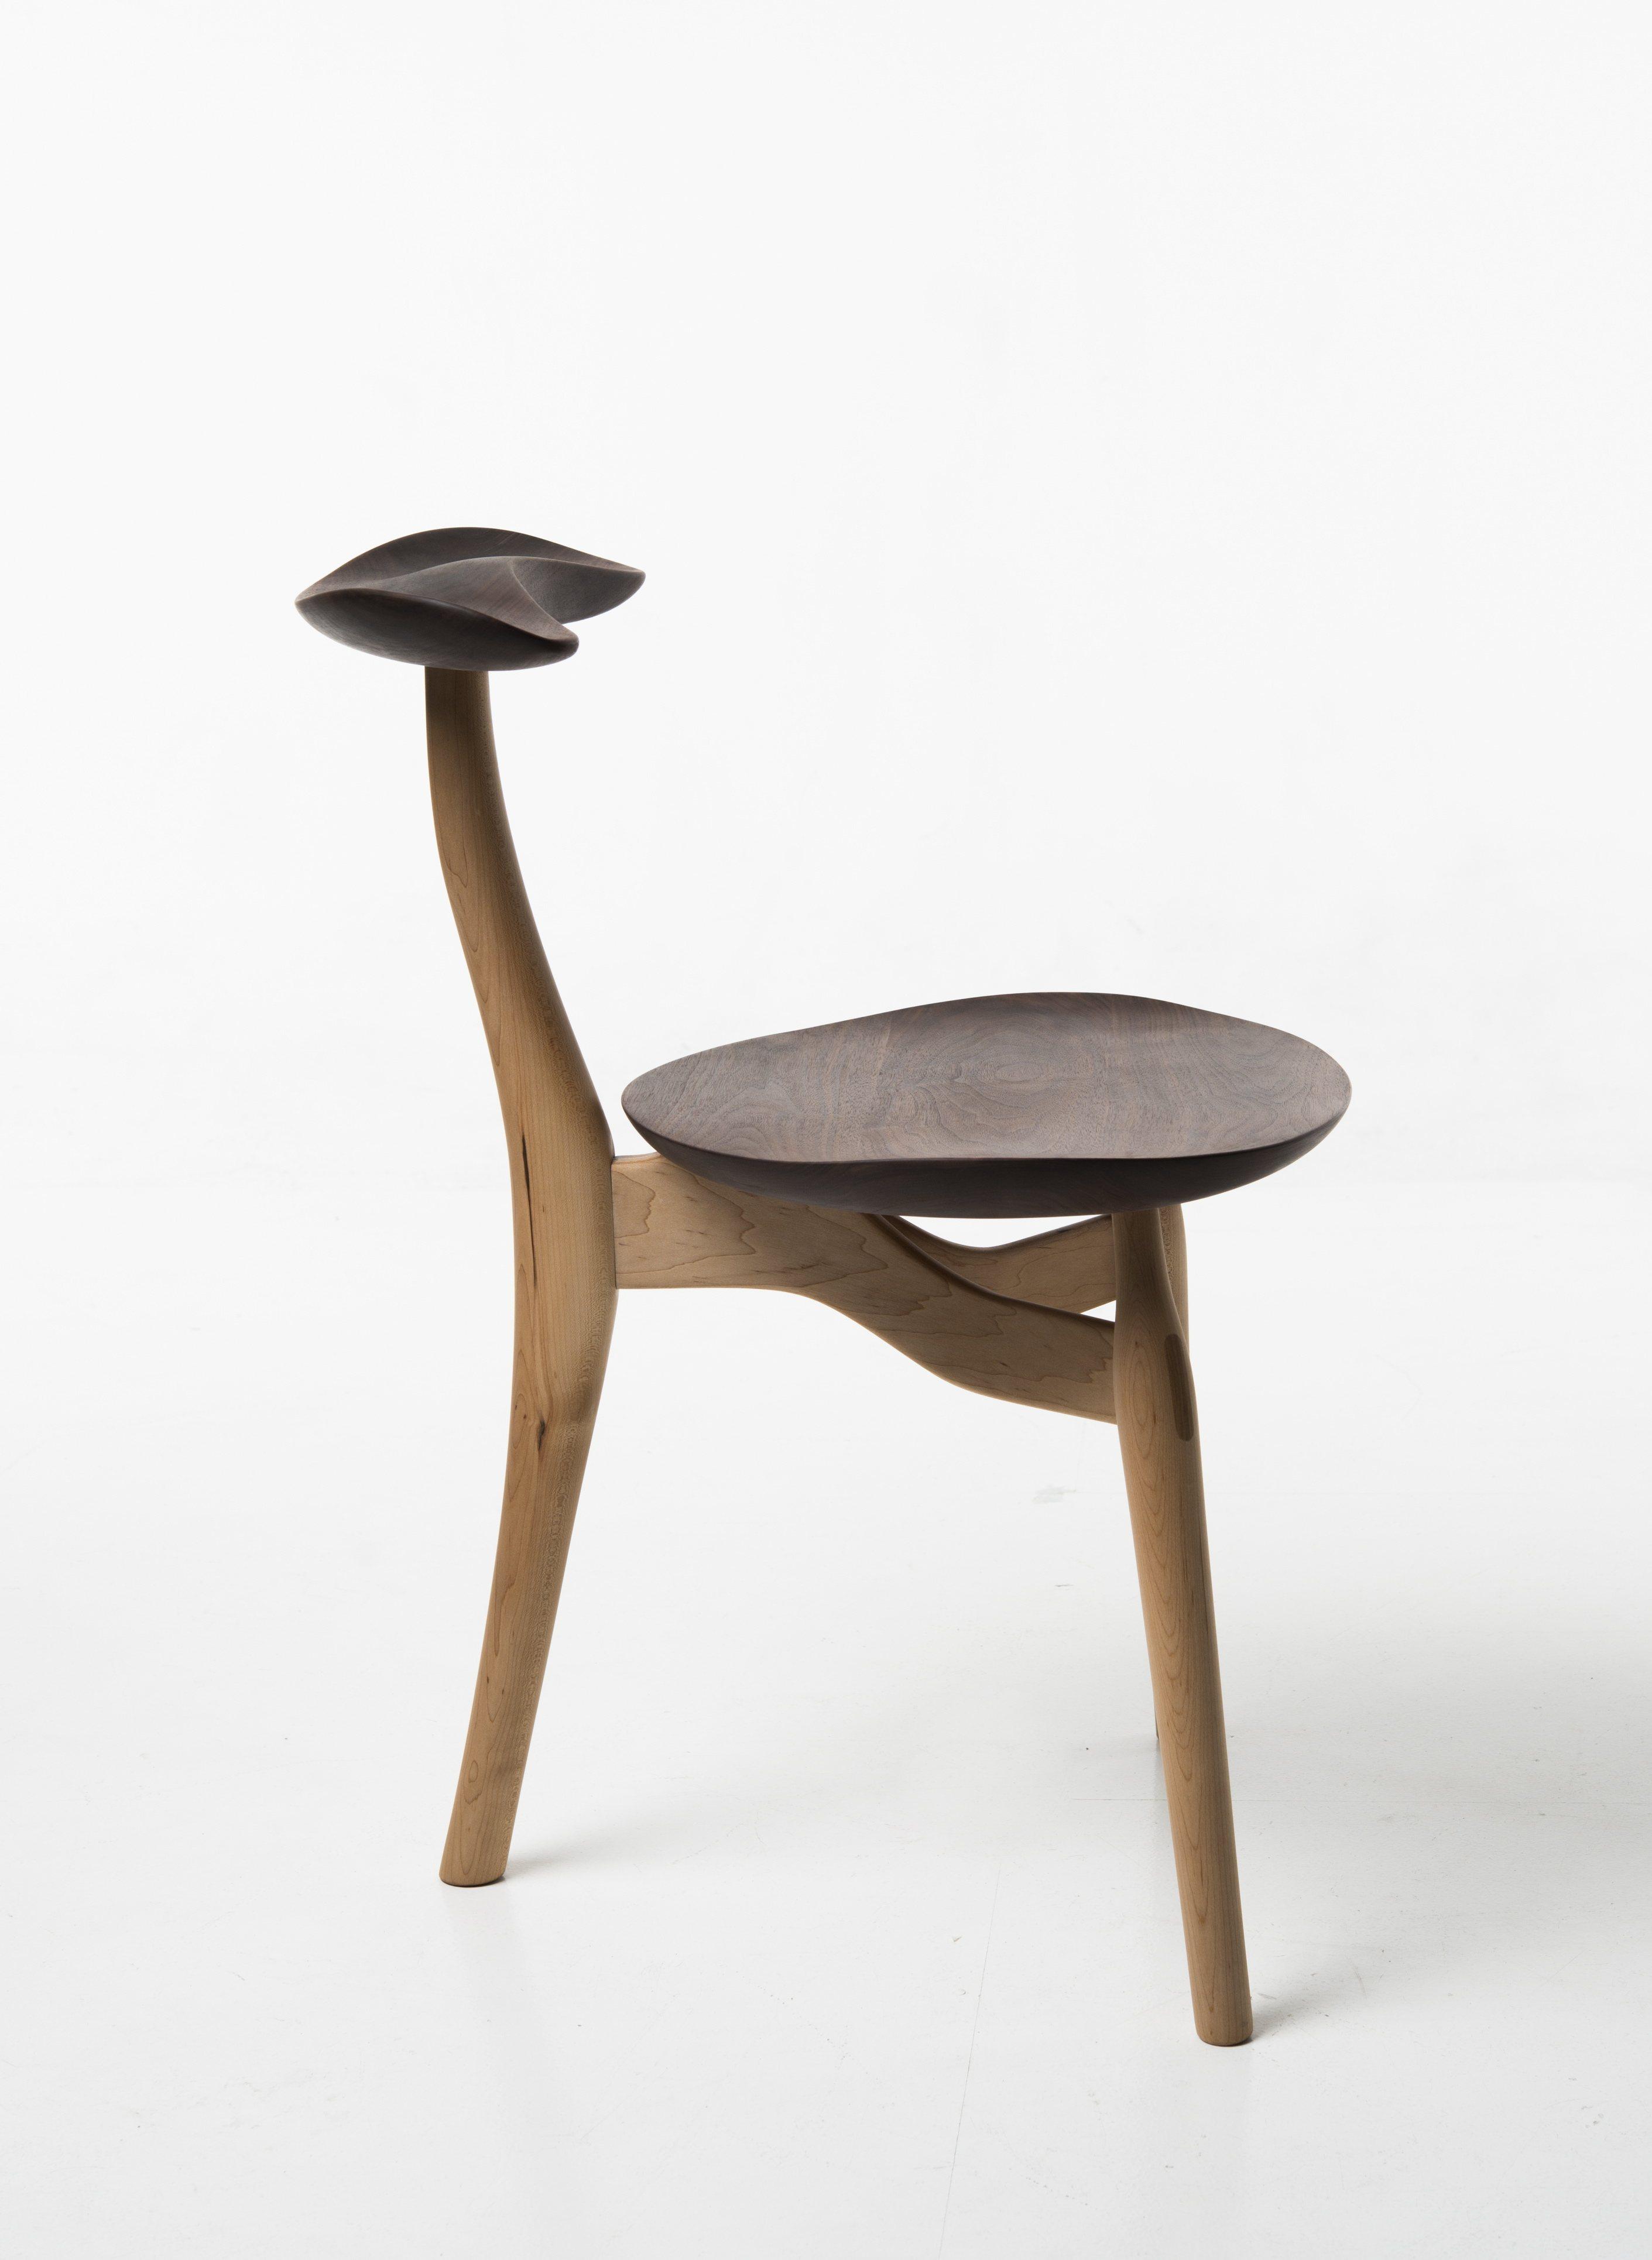 wooden chairs trialog wooden chair UUTVNKX